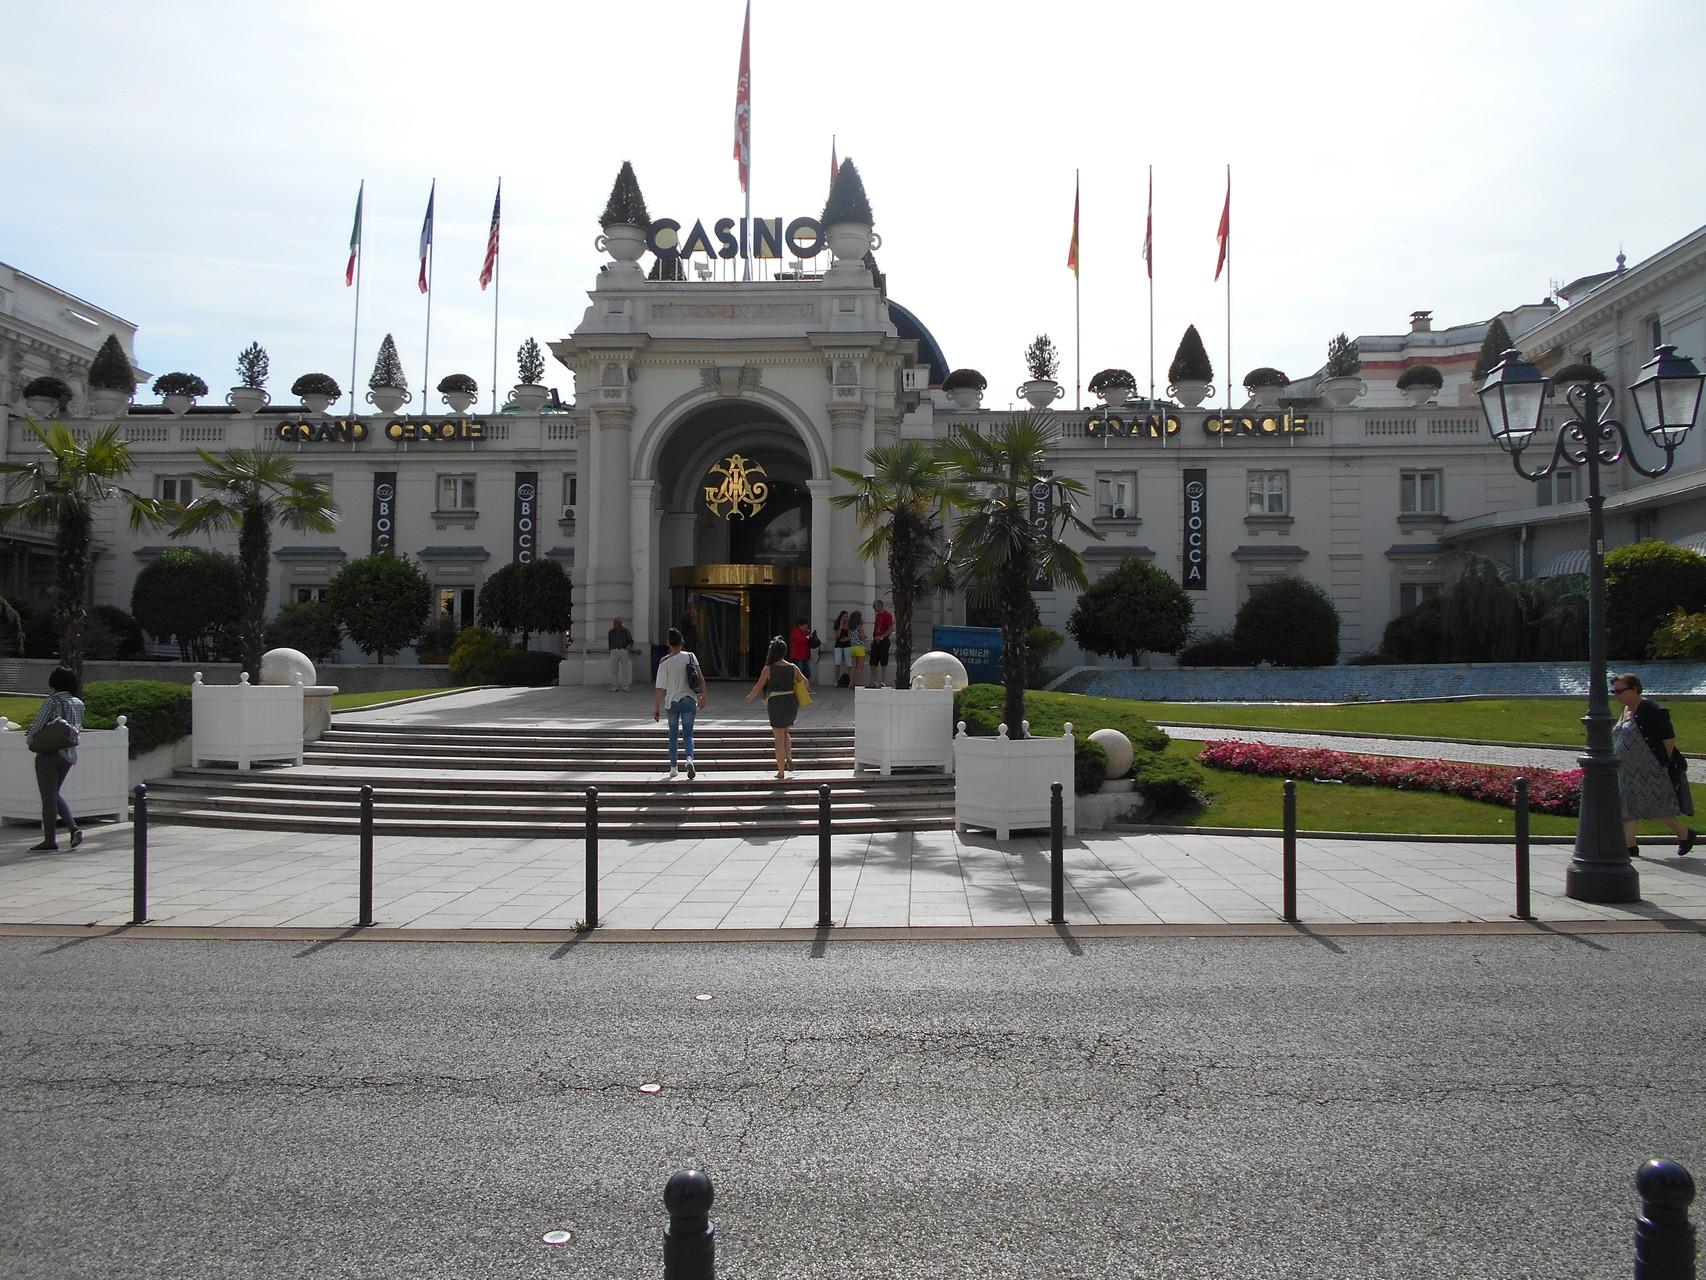 Le casino d'Aix les Bains